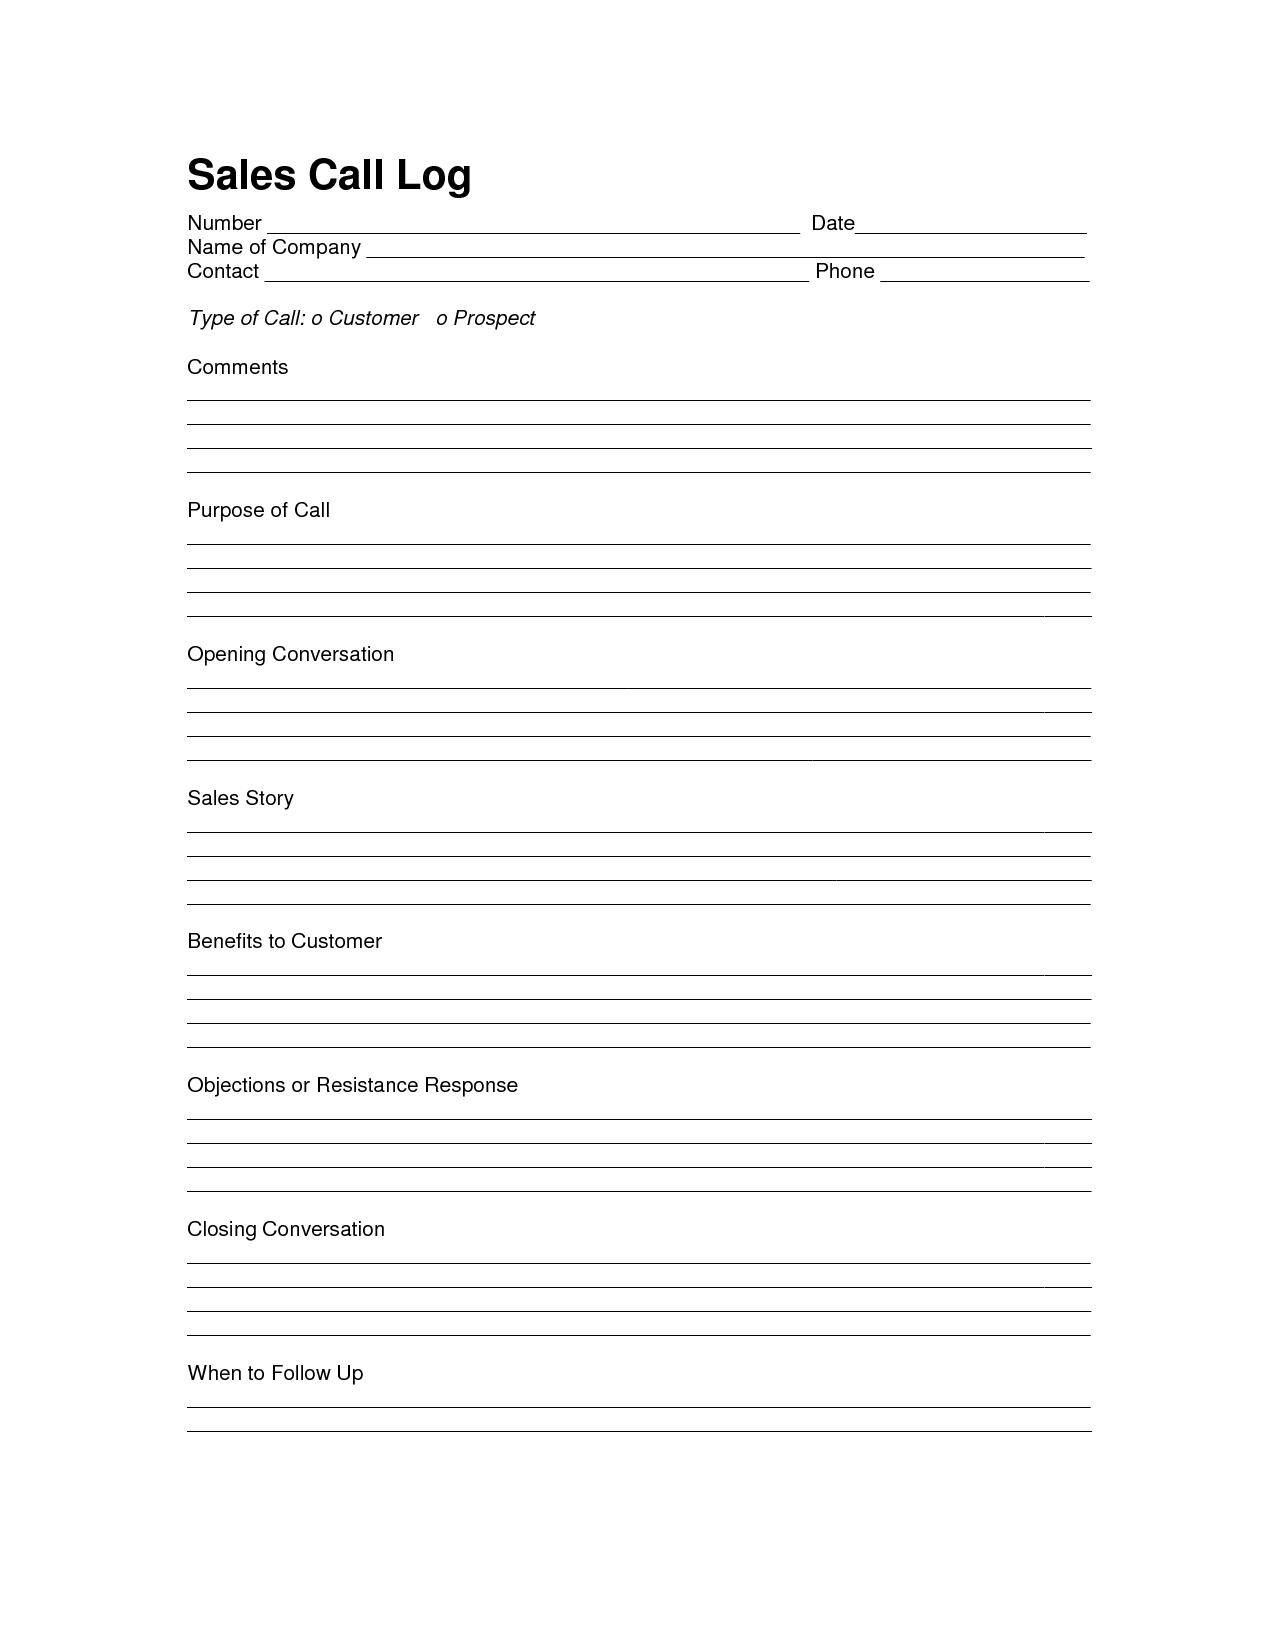 Sales Log Sheet Template   Sales Call Log Template   Sales with Sales Call Report Template